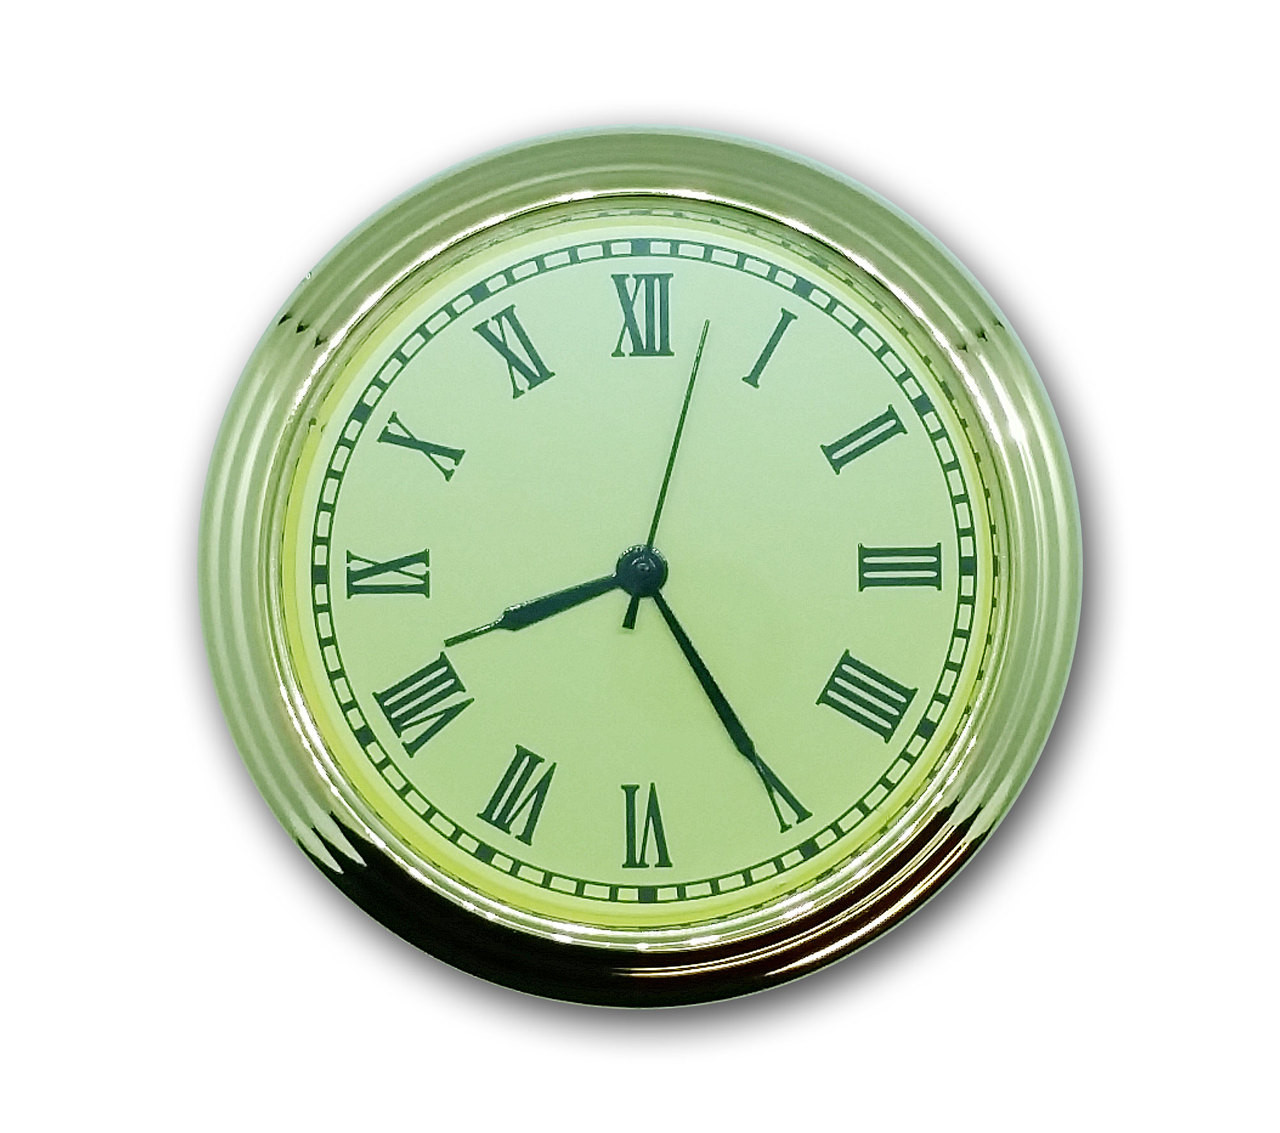 2 Inch (50mm) Ivory Roman Clock Insert/Fit Up